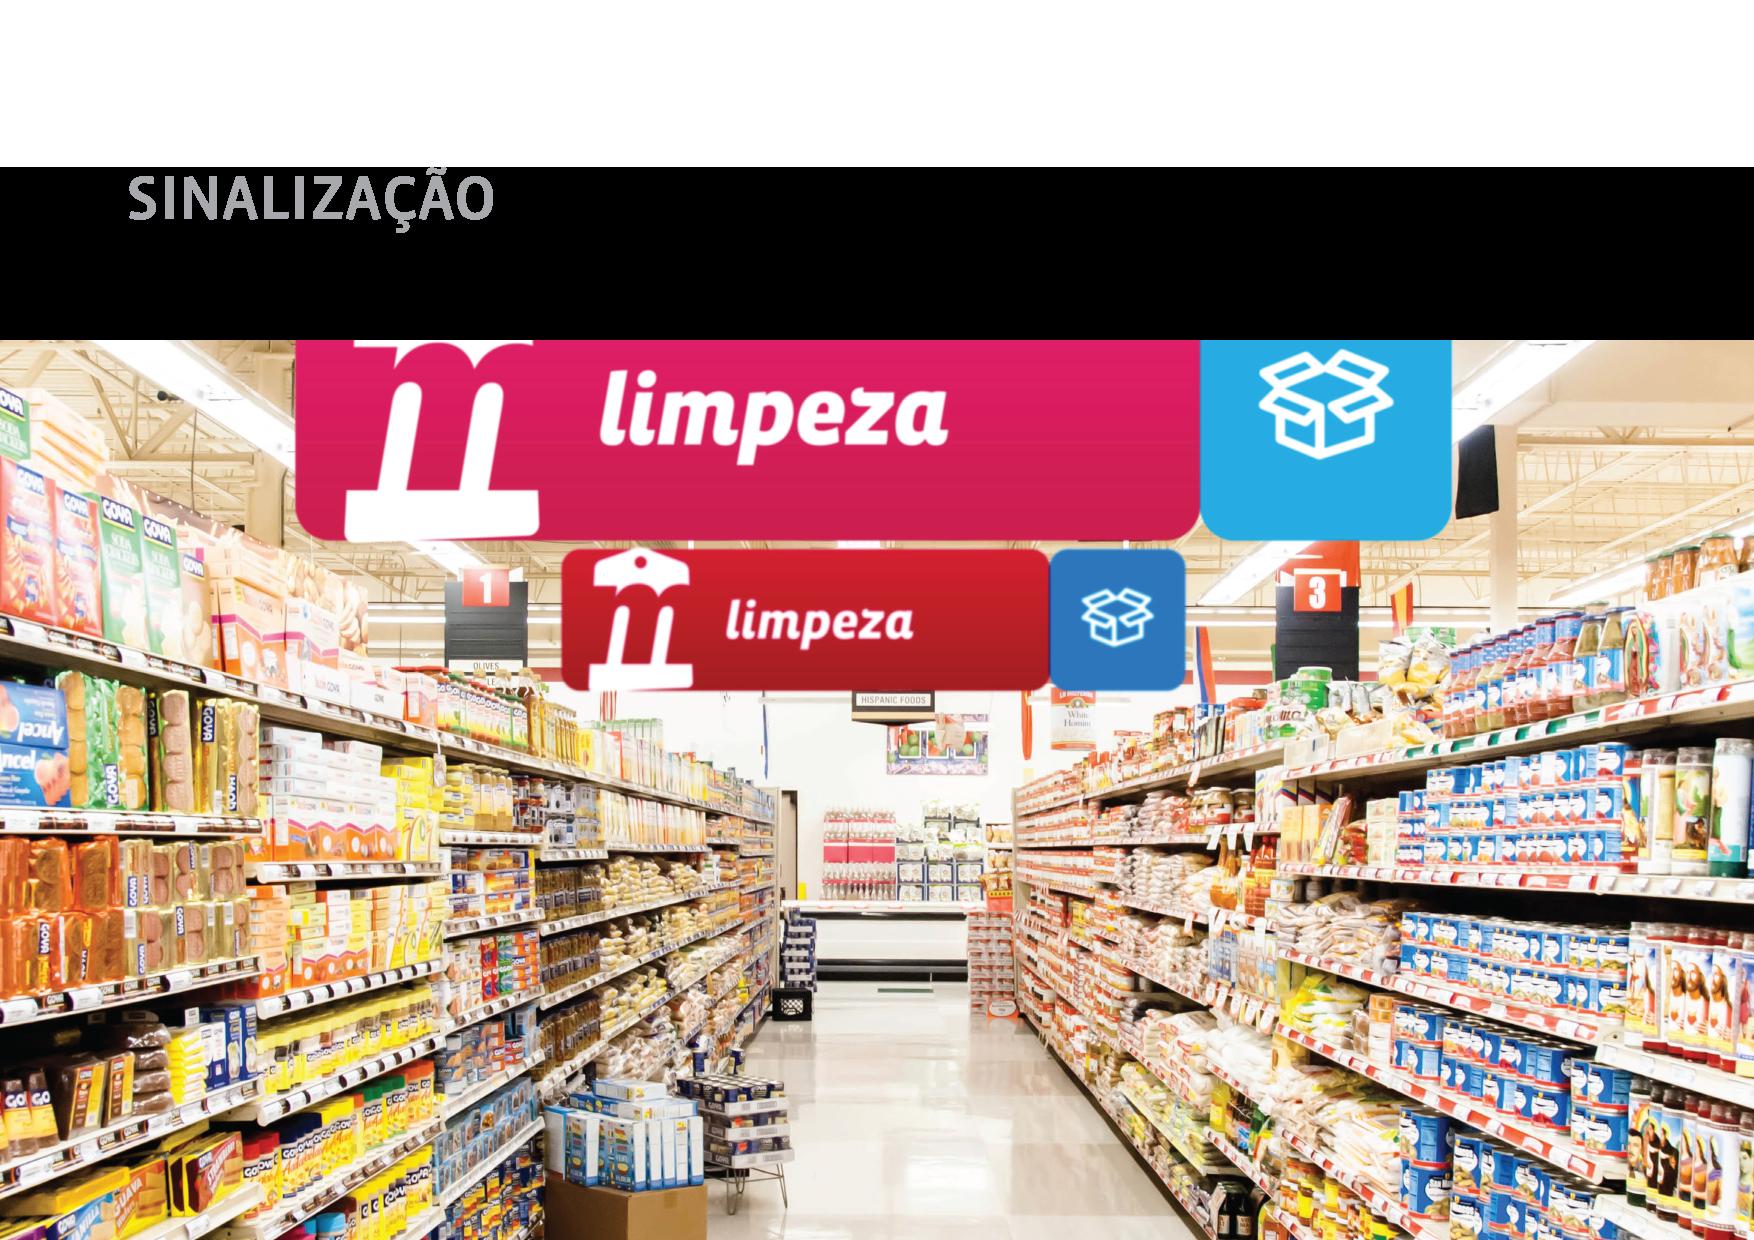 banner free download Supermarket clipart aisle. Est dio c o